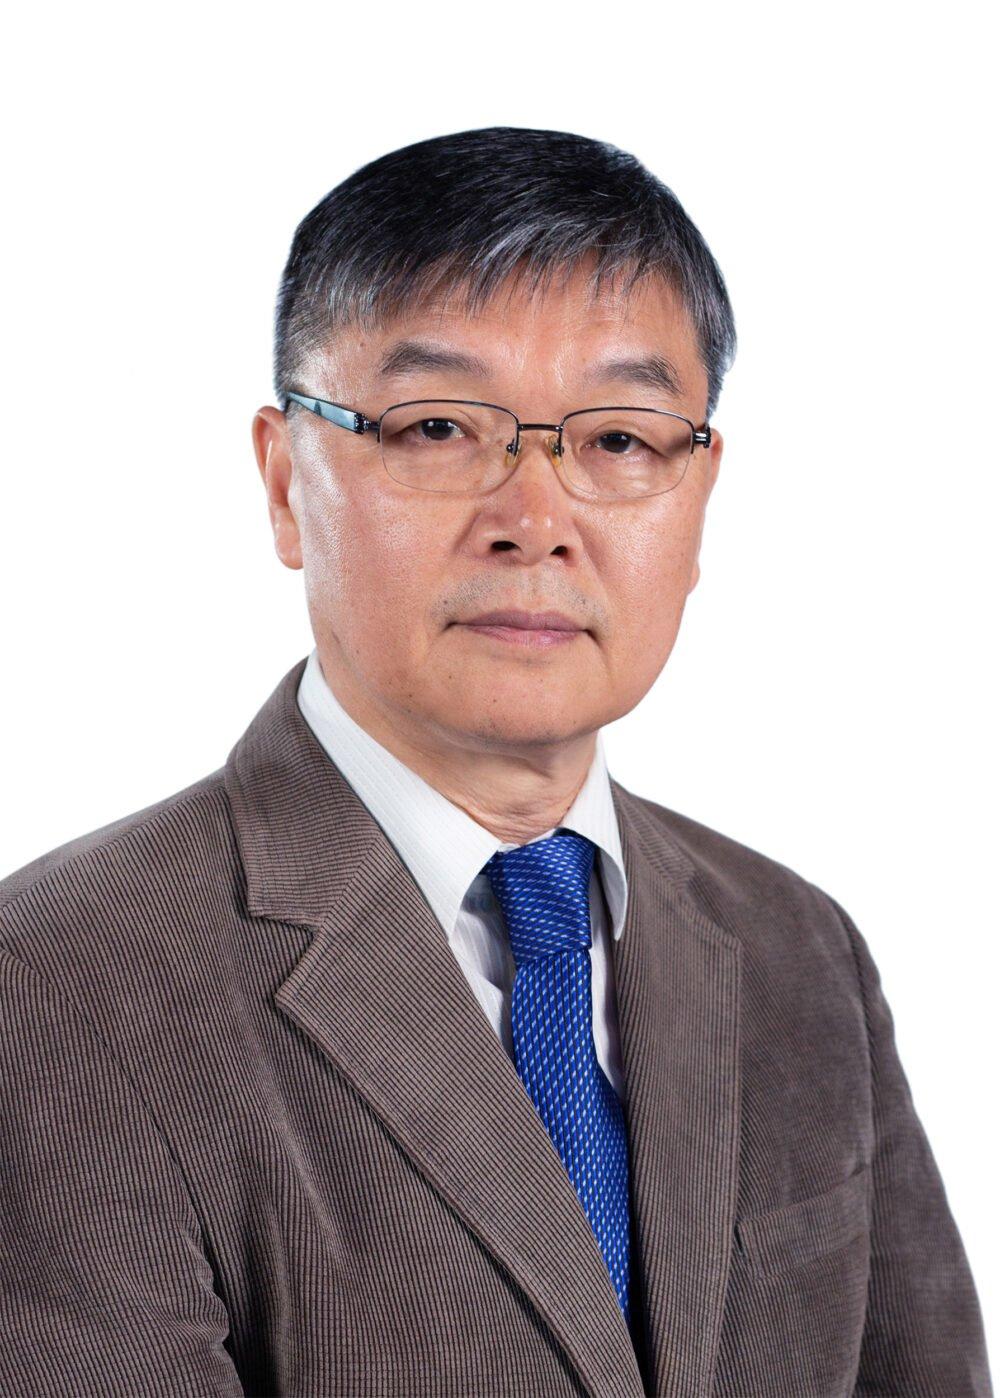 Dr. Lee Choon Heung